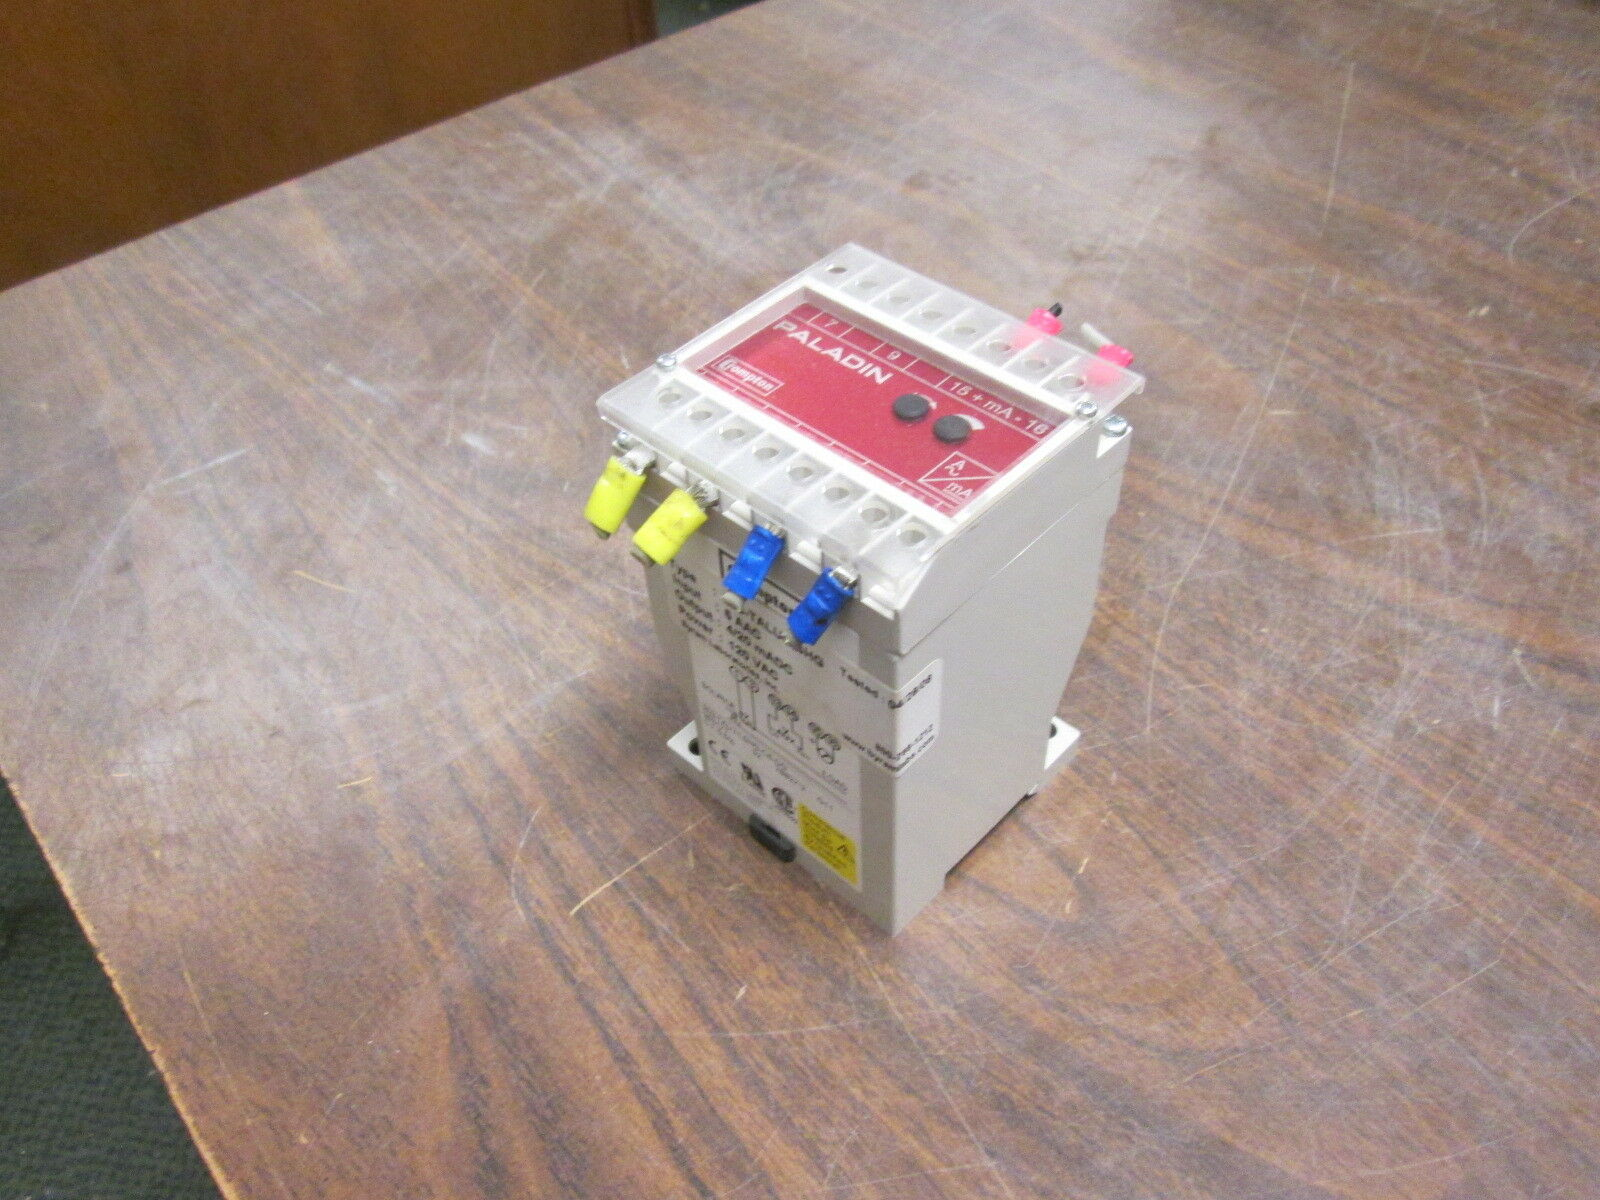 Crompton Paladin Transducer 253-TALU-LSHG Input  5A AC Output  4 20mA DC Used